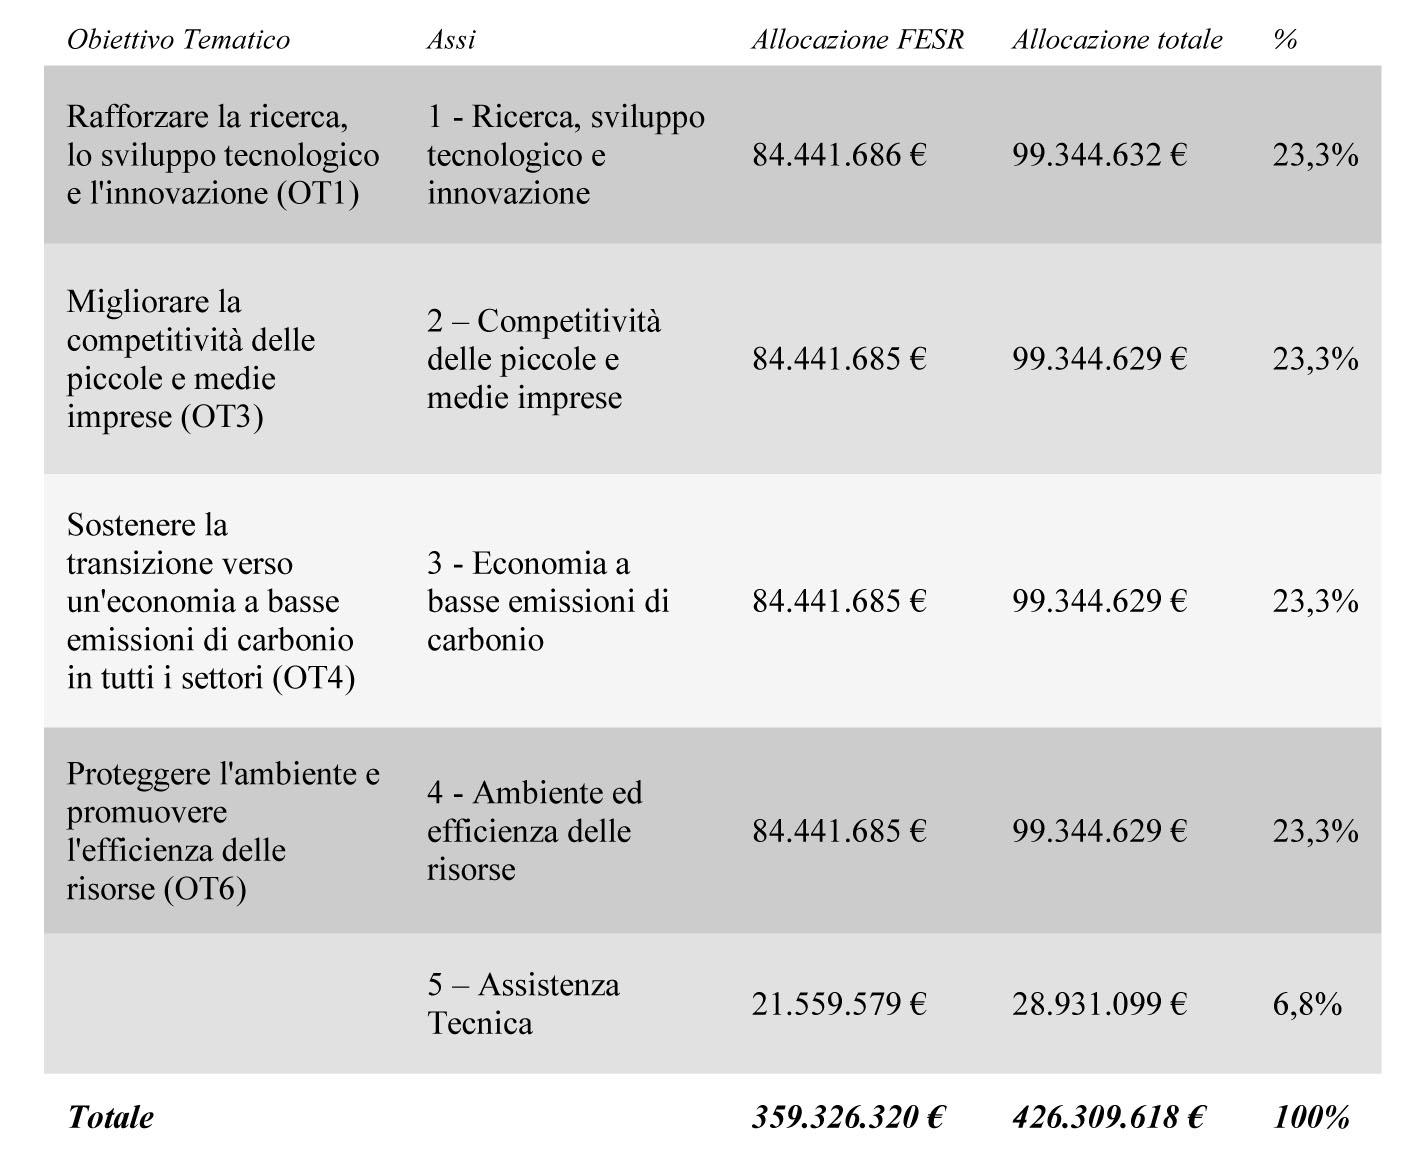 interreg-europe v01 TAB